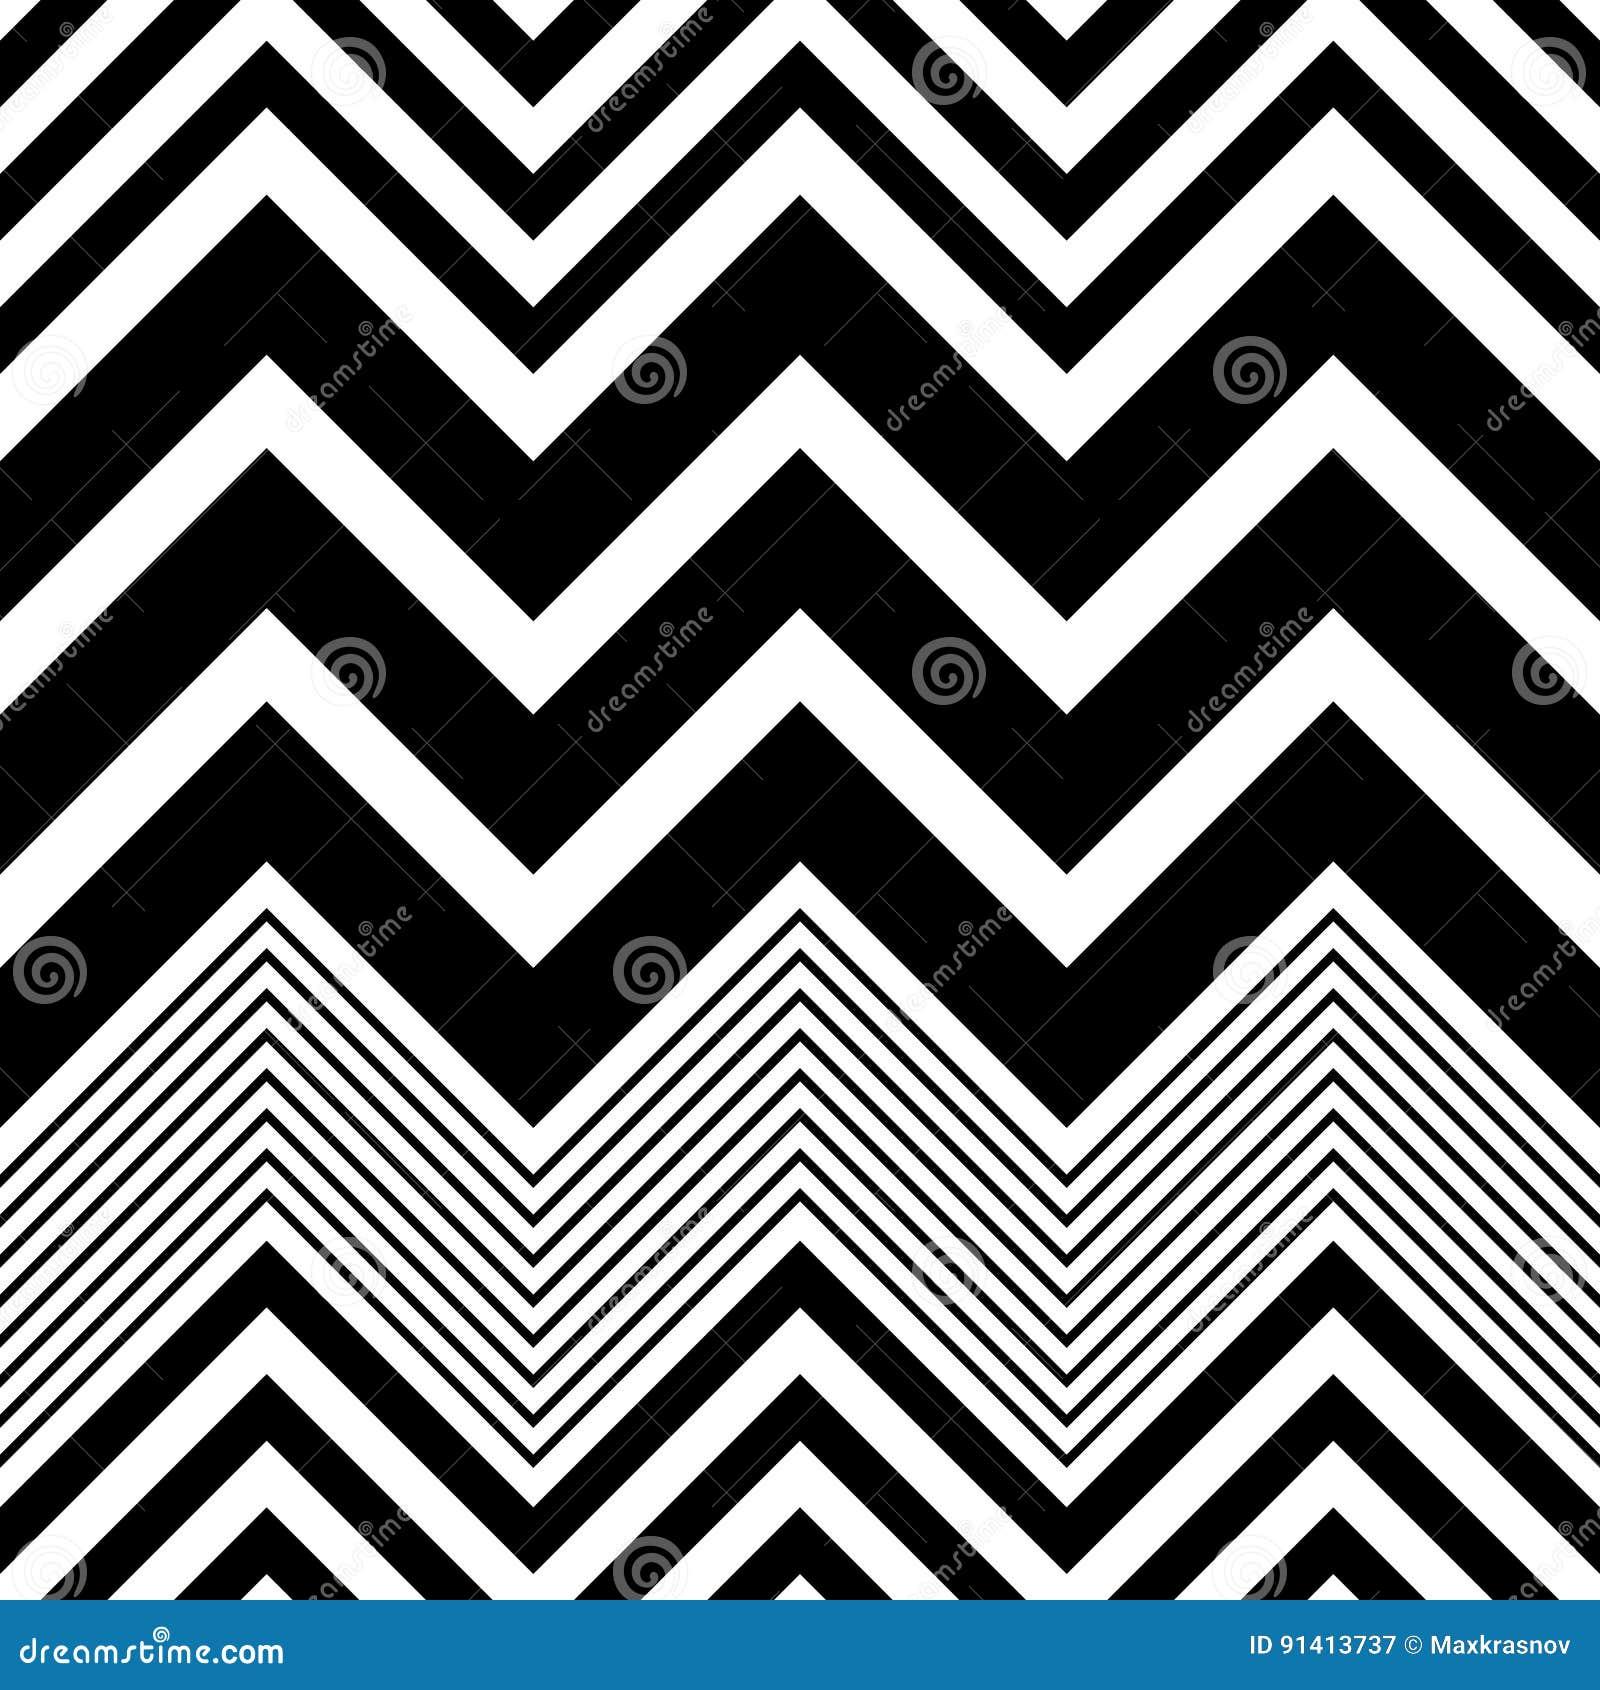 Minimalist Black And White Geometric Wallpaper Homecid